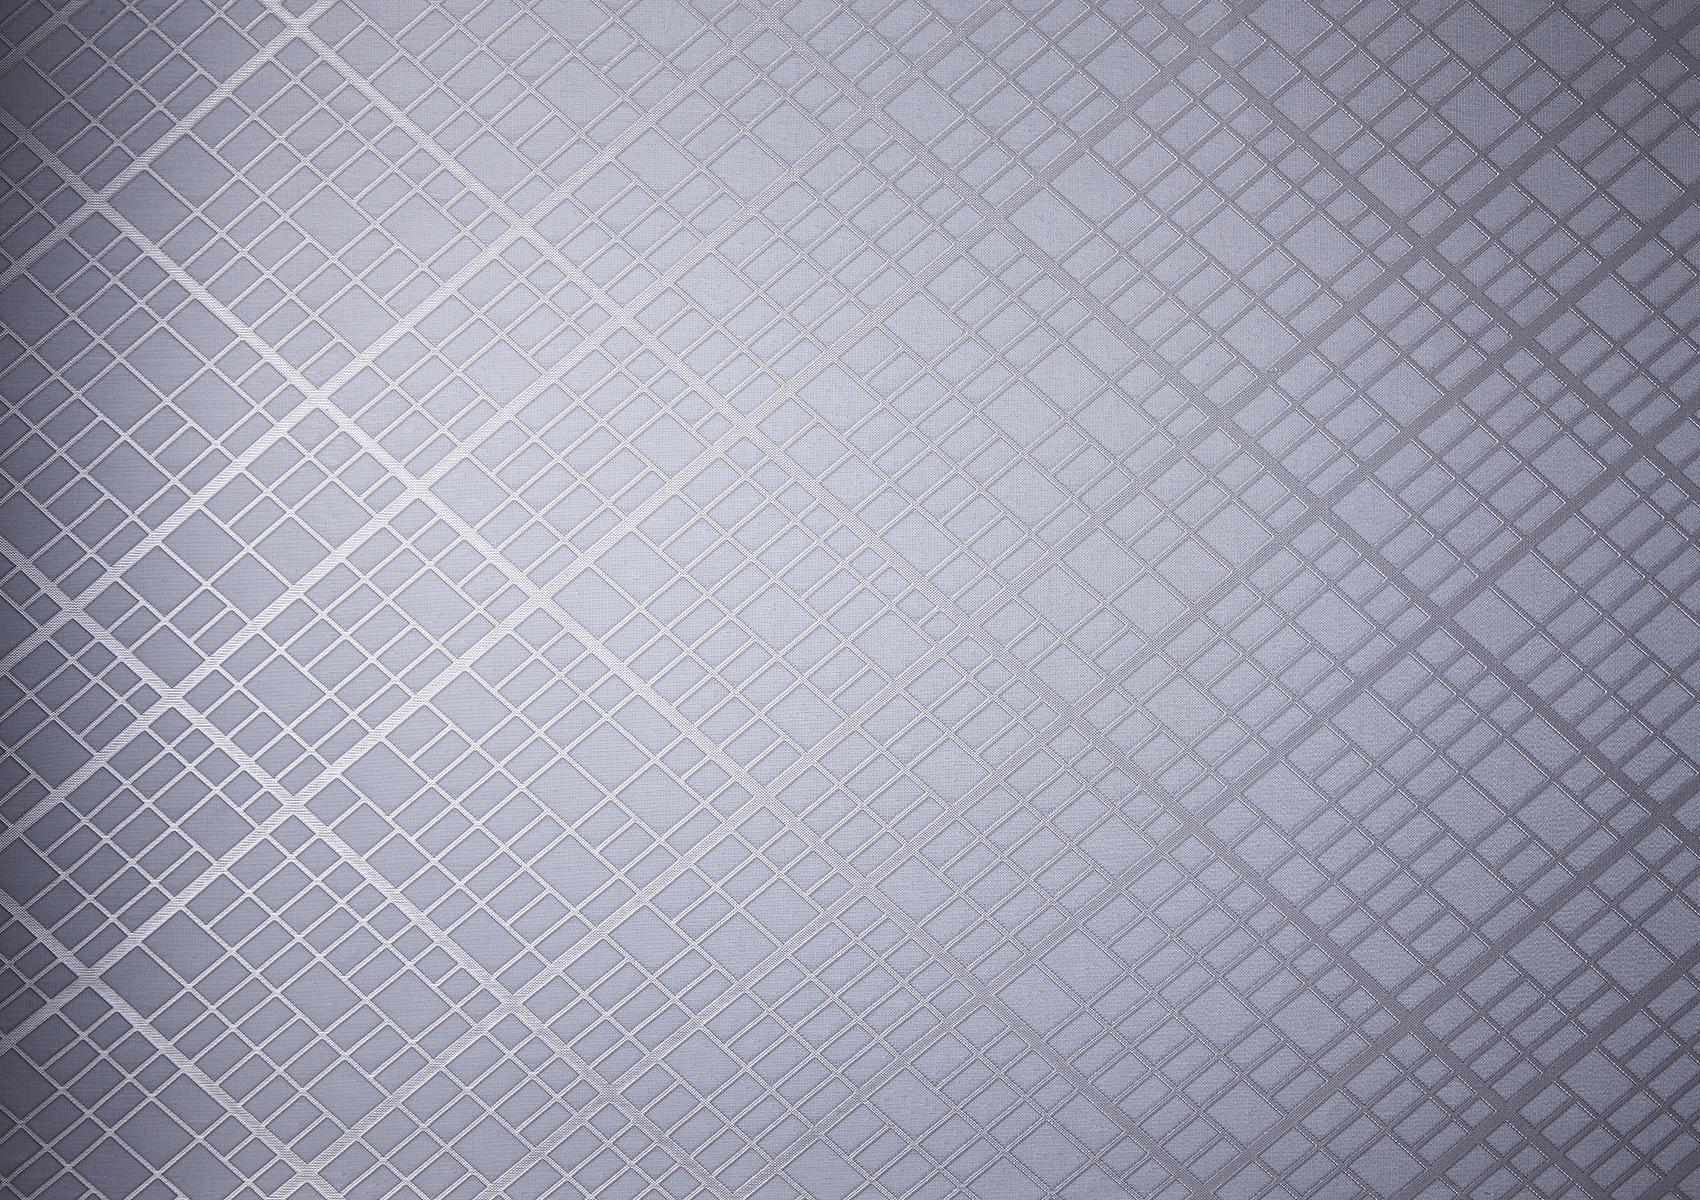 fabric_kyoto_oji_whitegrey1